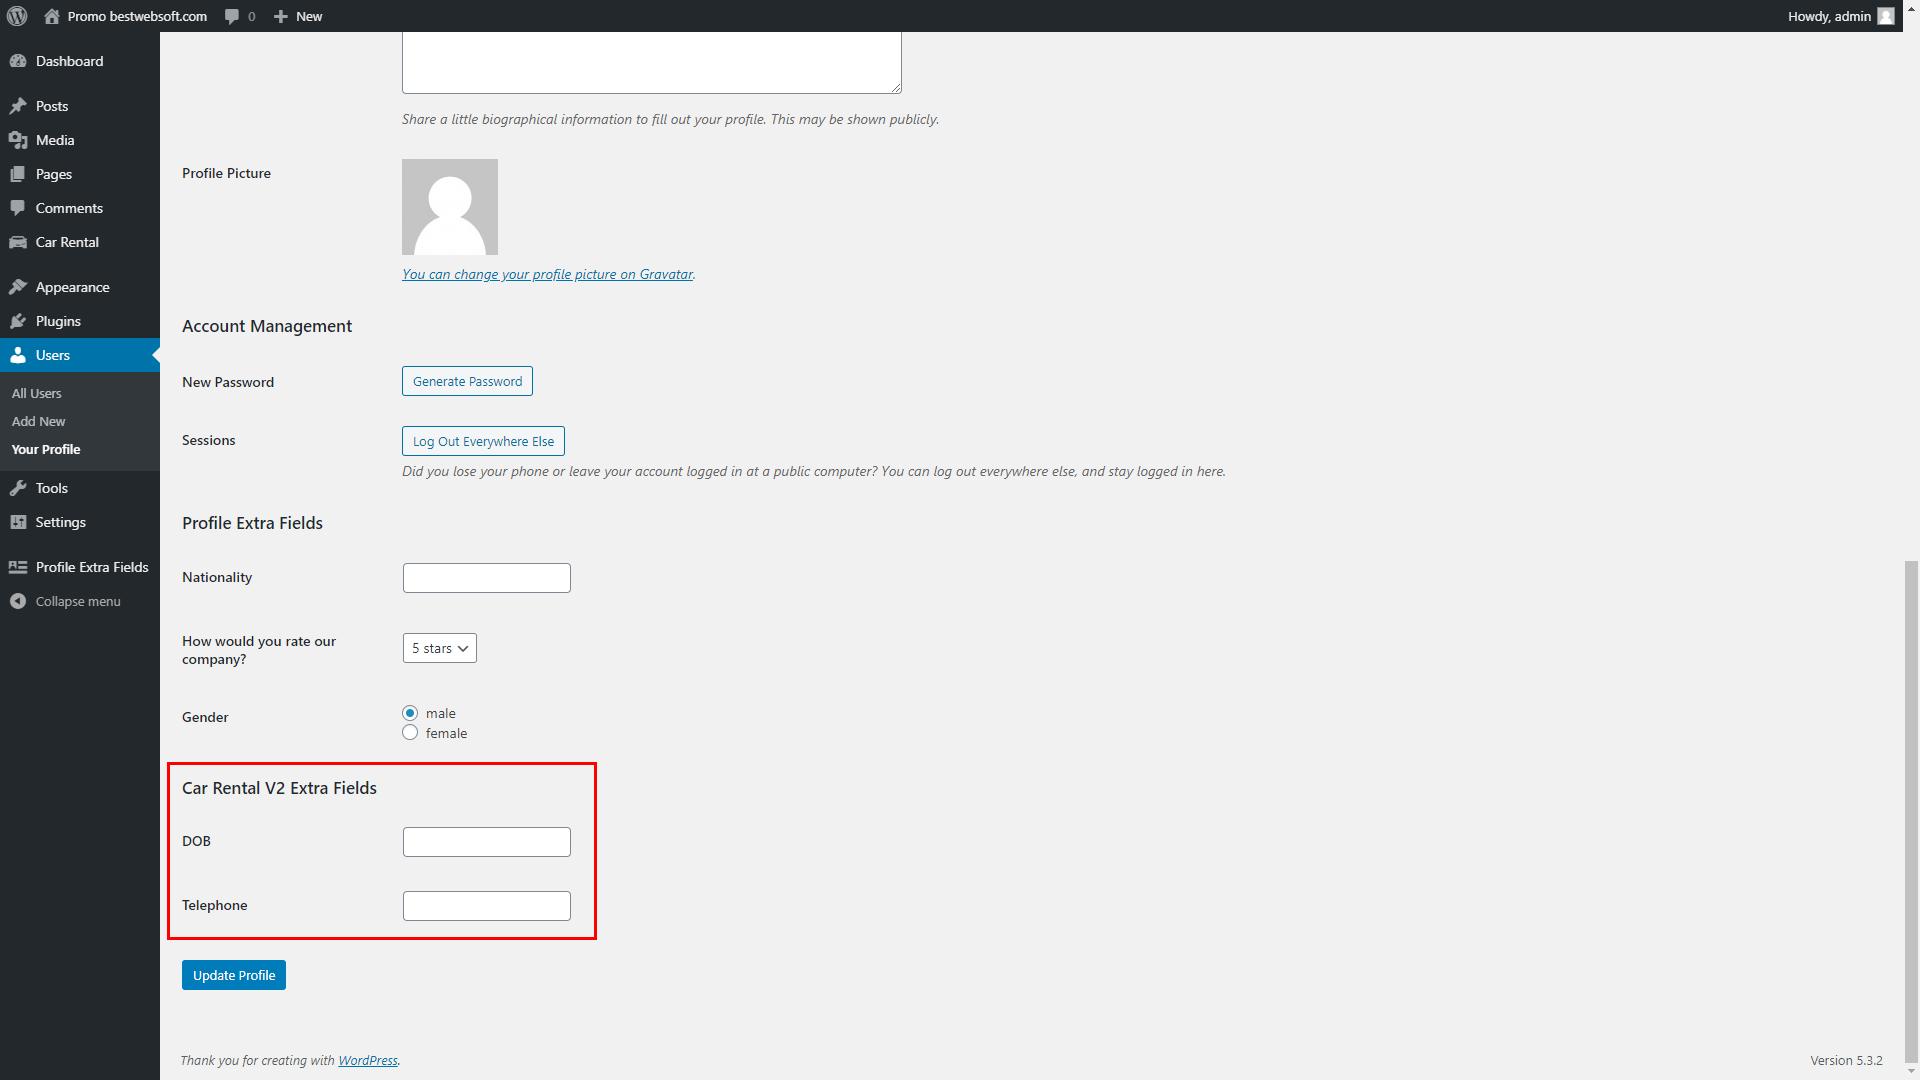 profile extra fields screenshot 19